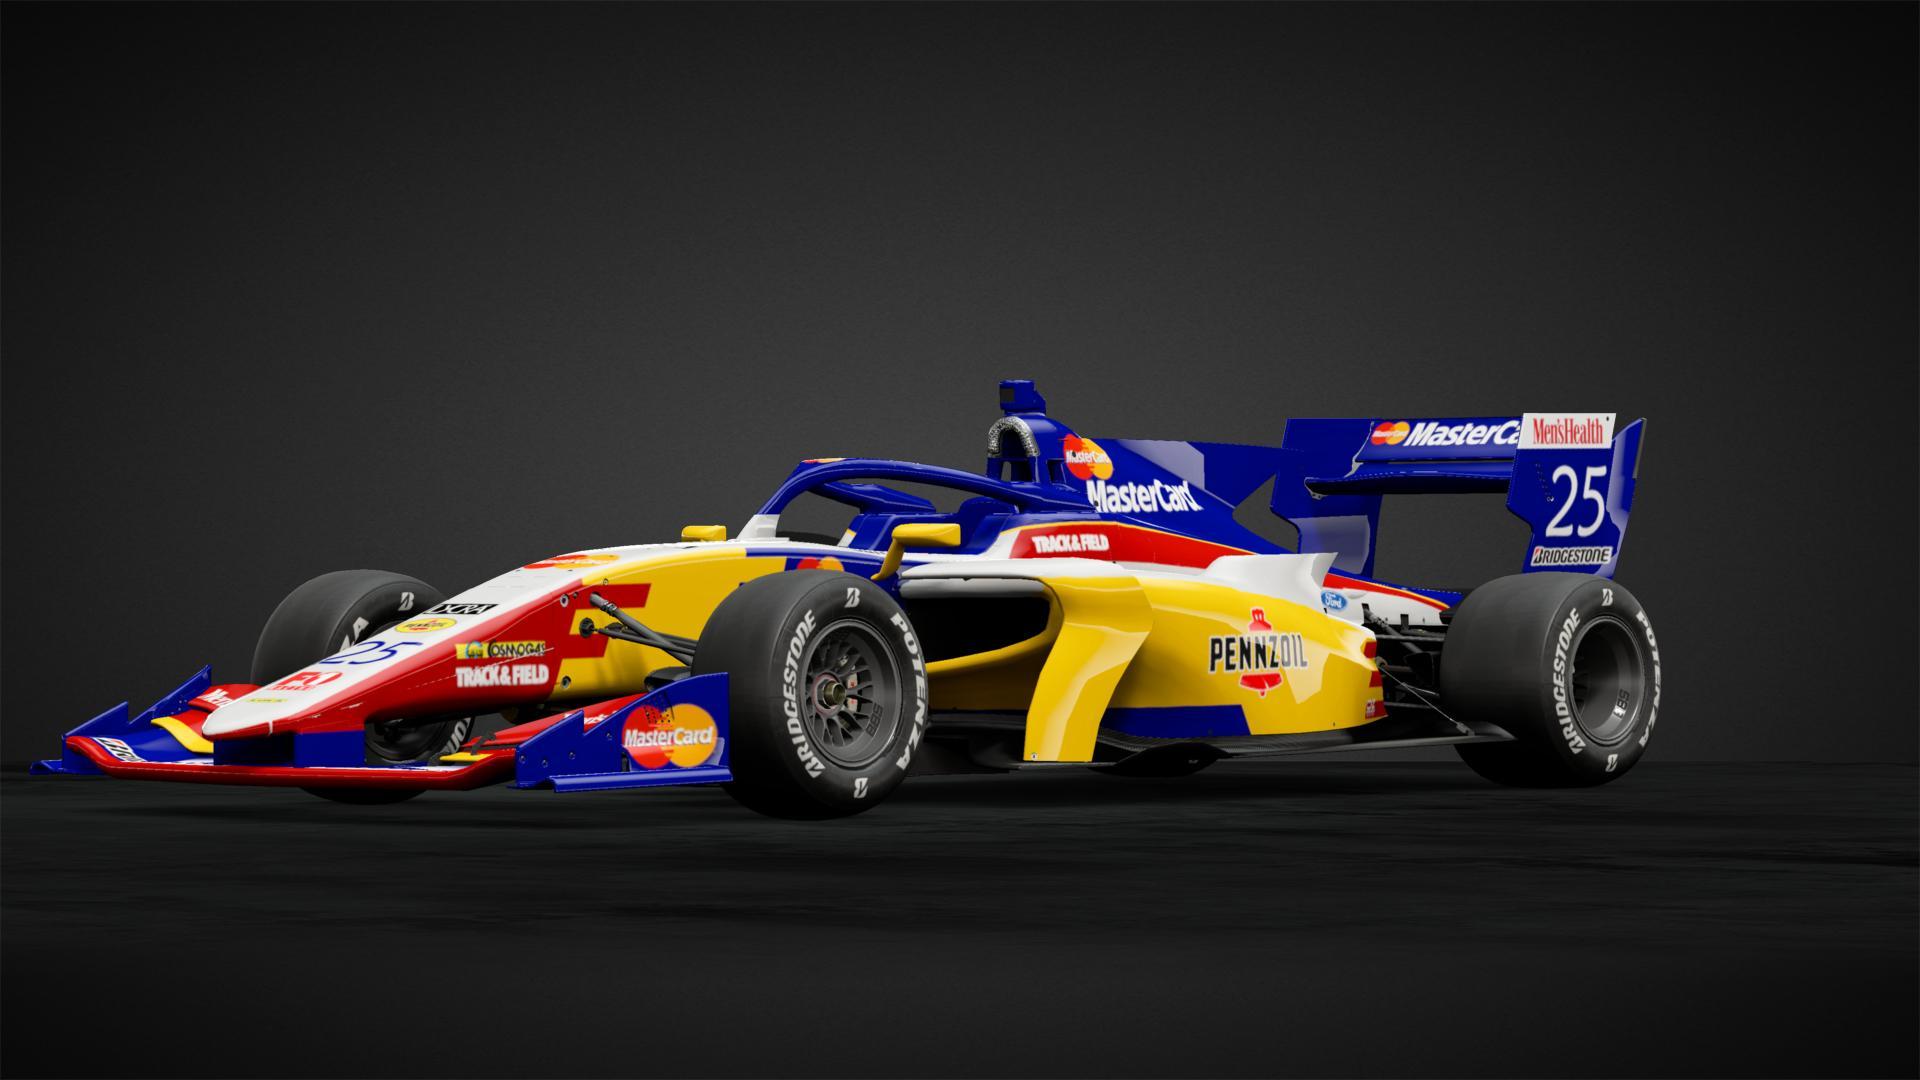 Mastercard Lola F1 Teams Background 2